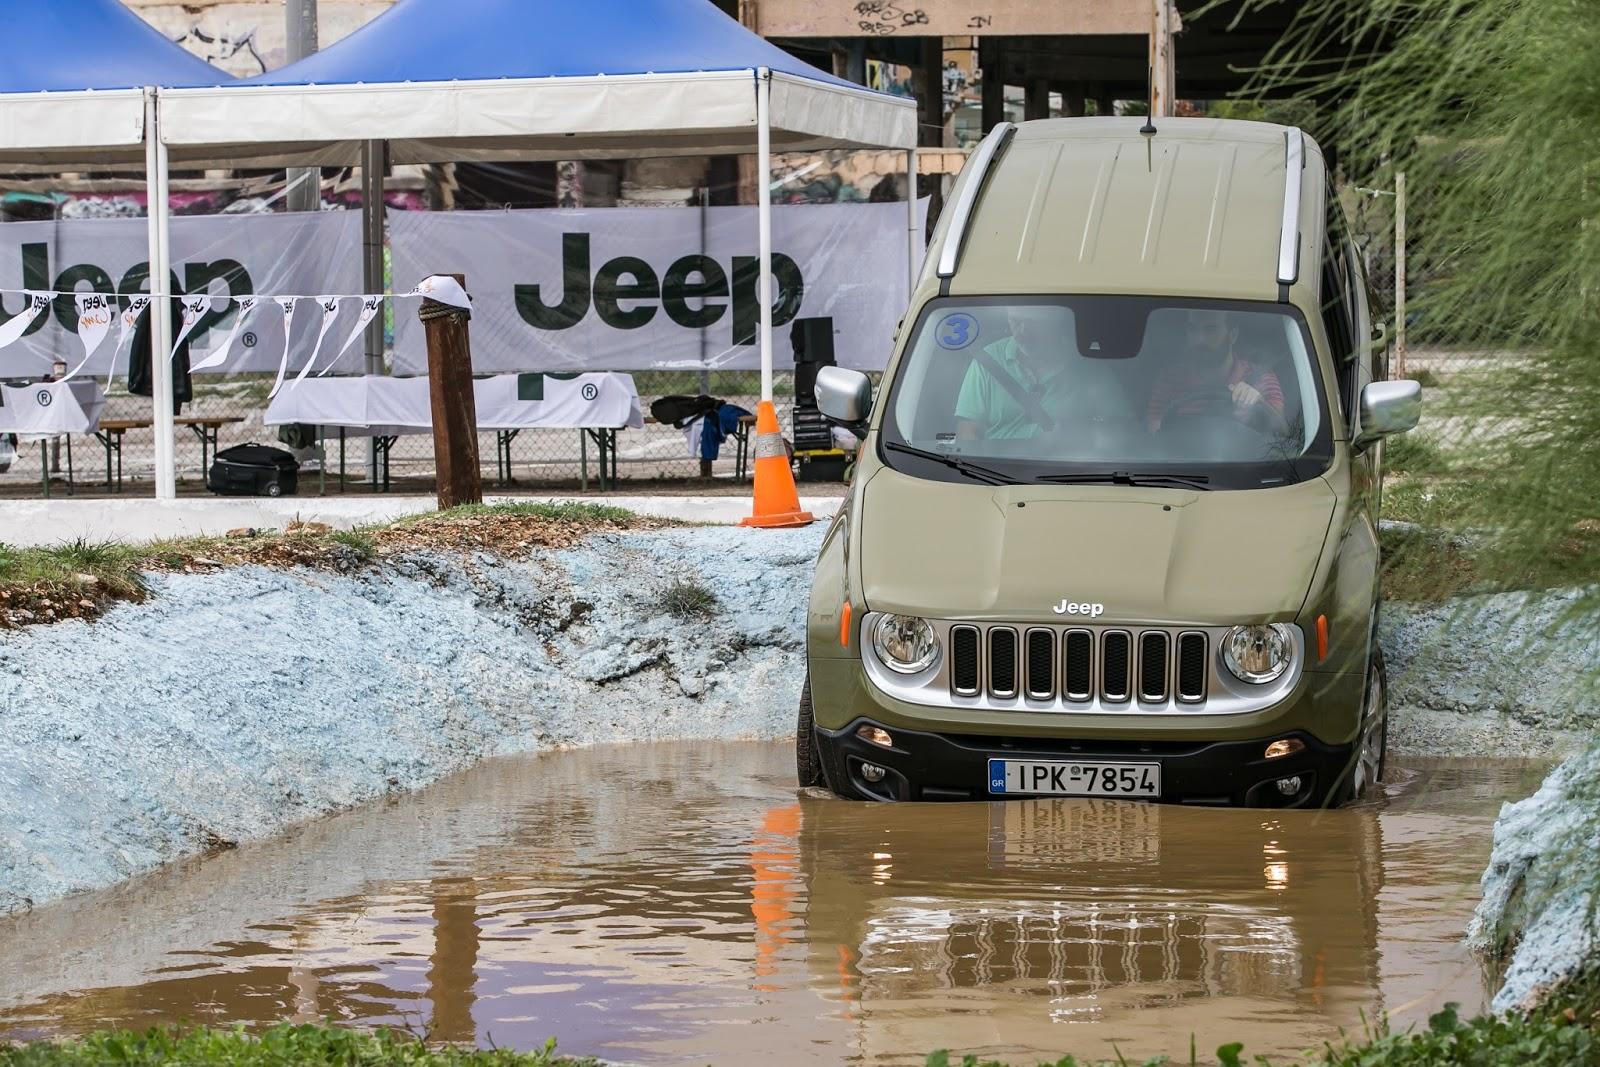 KF 1611 Πετάμε ένα Jeep Renegade σε λάσπες, πέτρες, άμμο, λίμνες. Θα τα καταφέρει;